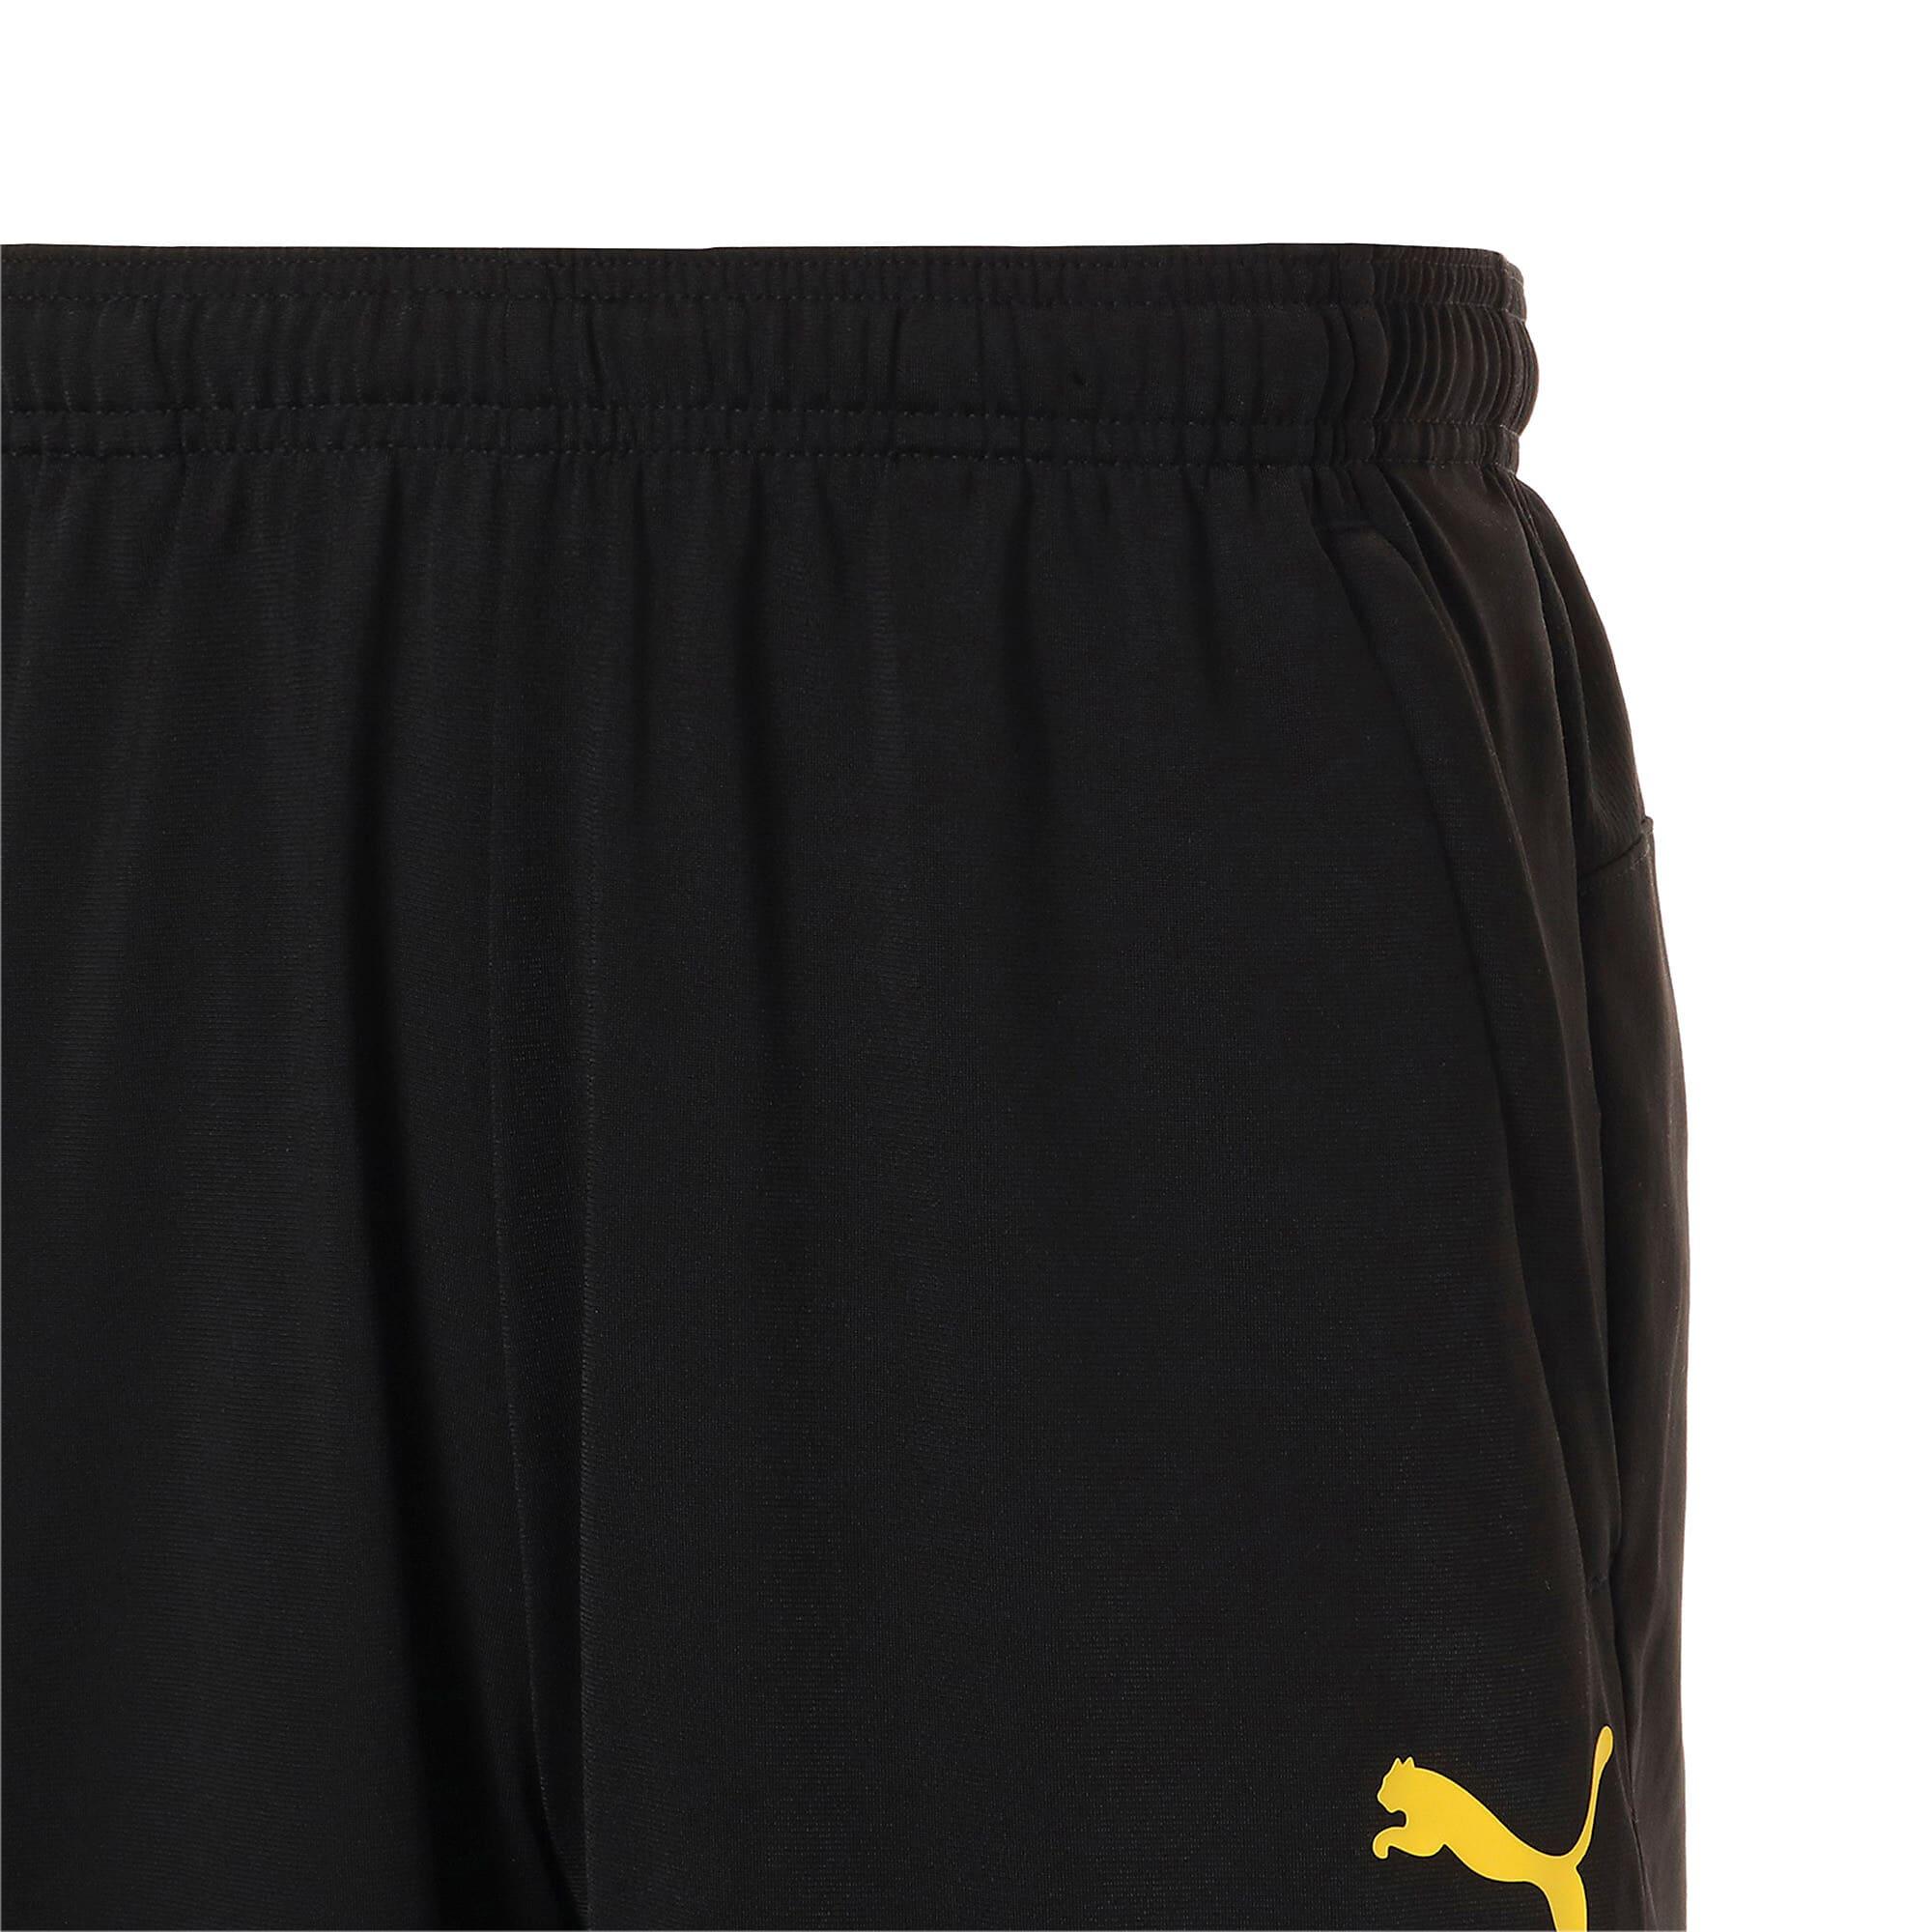 Thumbnail 8 of ドルトムント BVB トレーニング パンツ, Puma Black-Cyber Yellow, medium-JPN